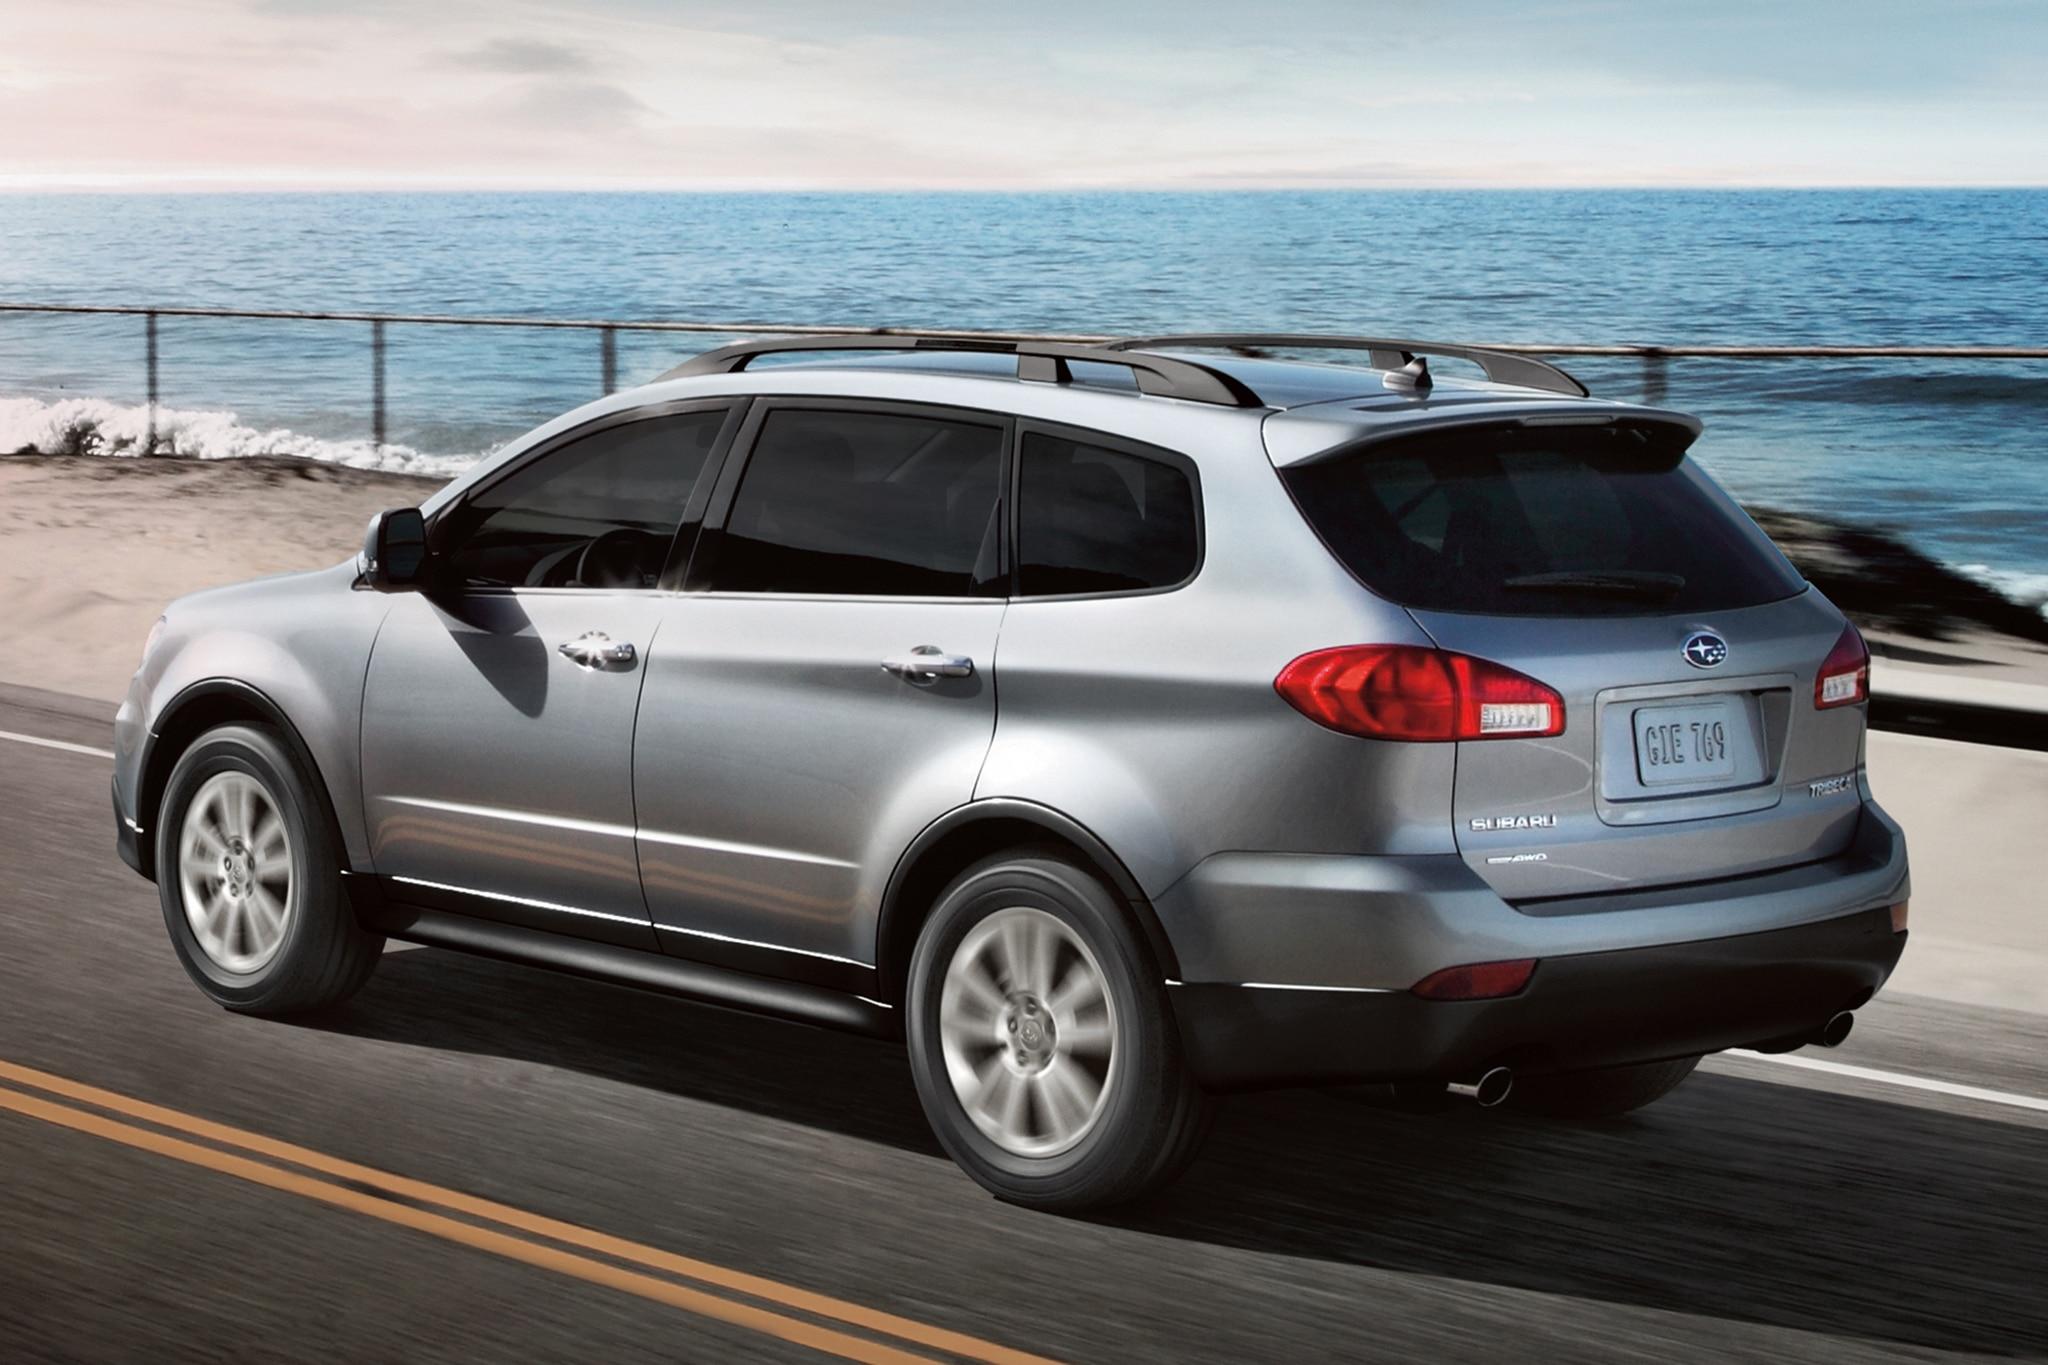 Subaru Tribeca Production Ends January 2014